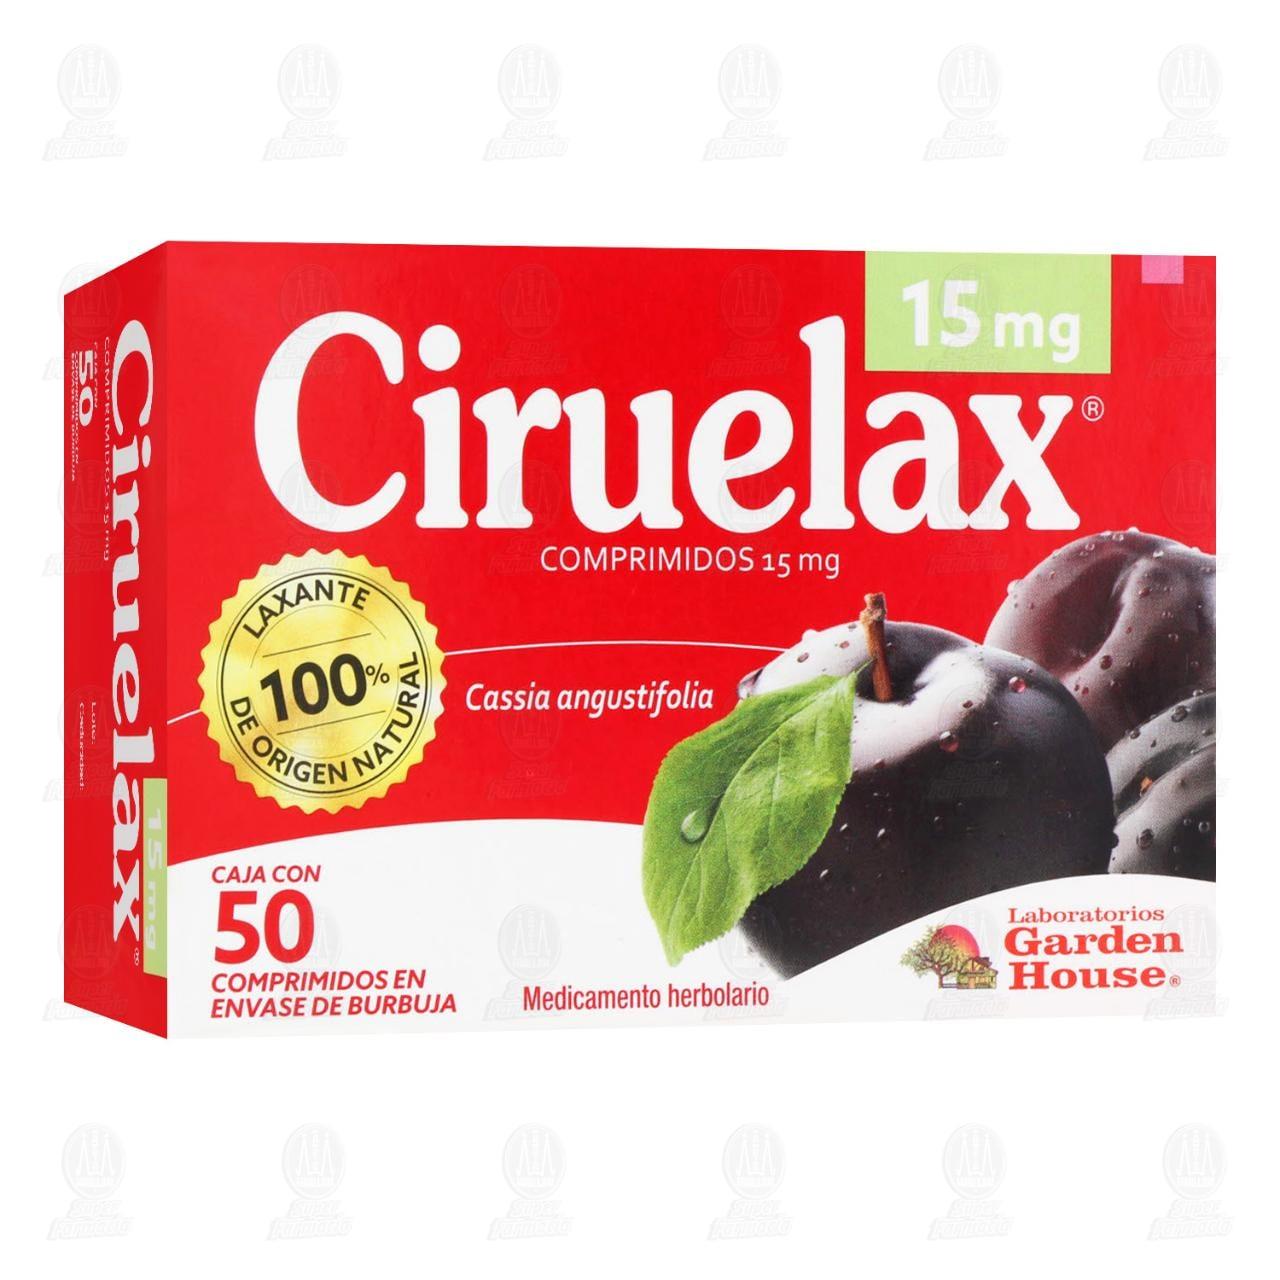 Ciruelax 50 Comprimidos